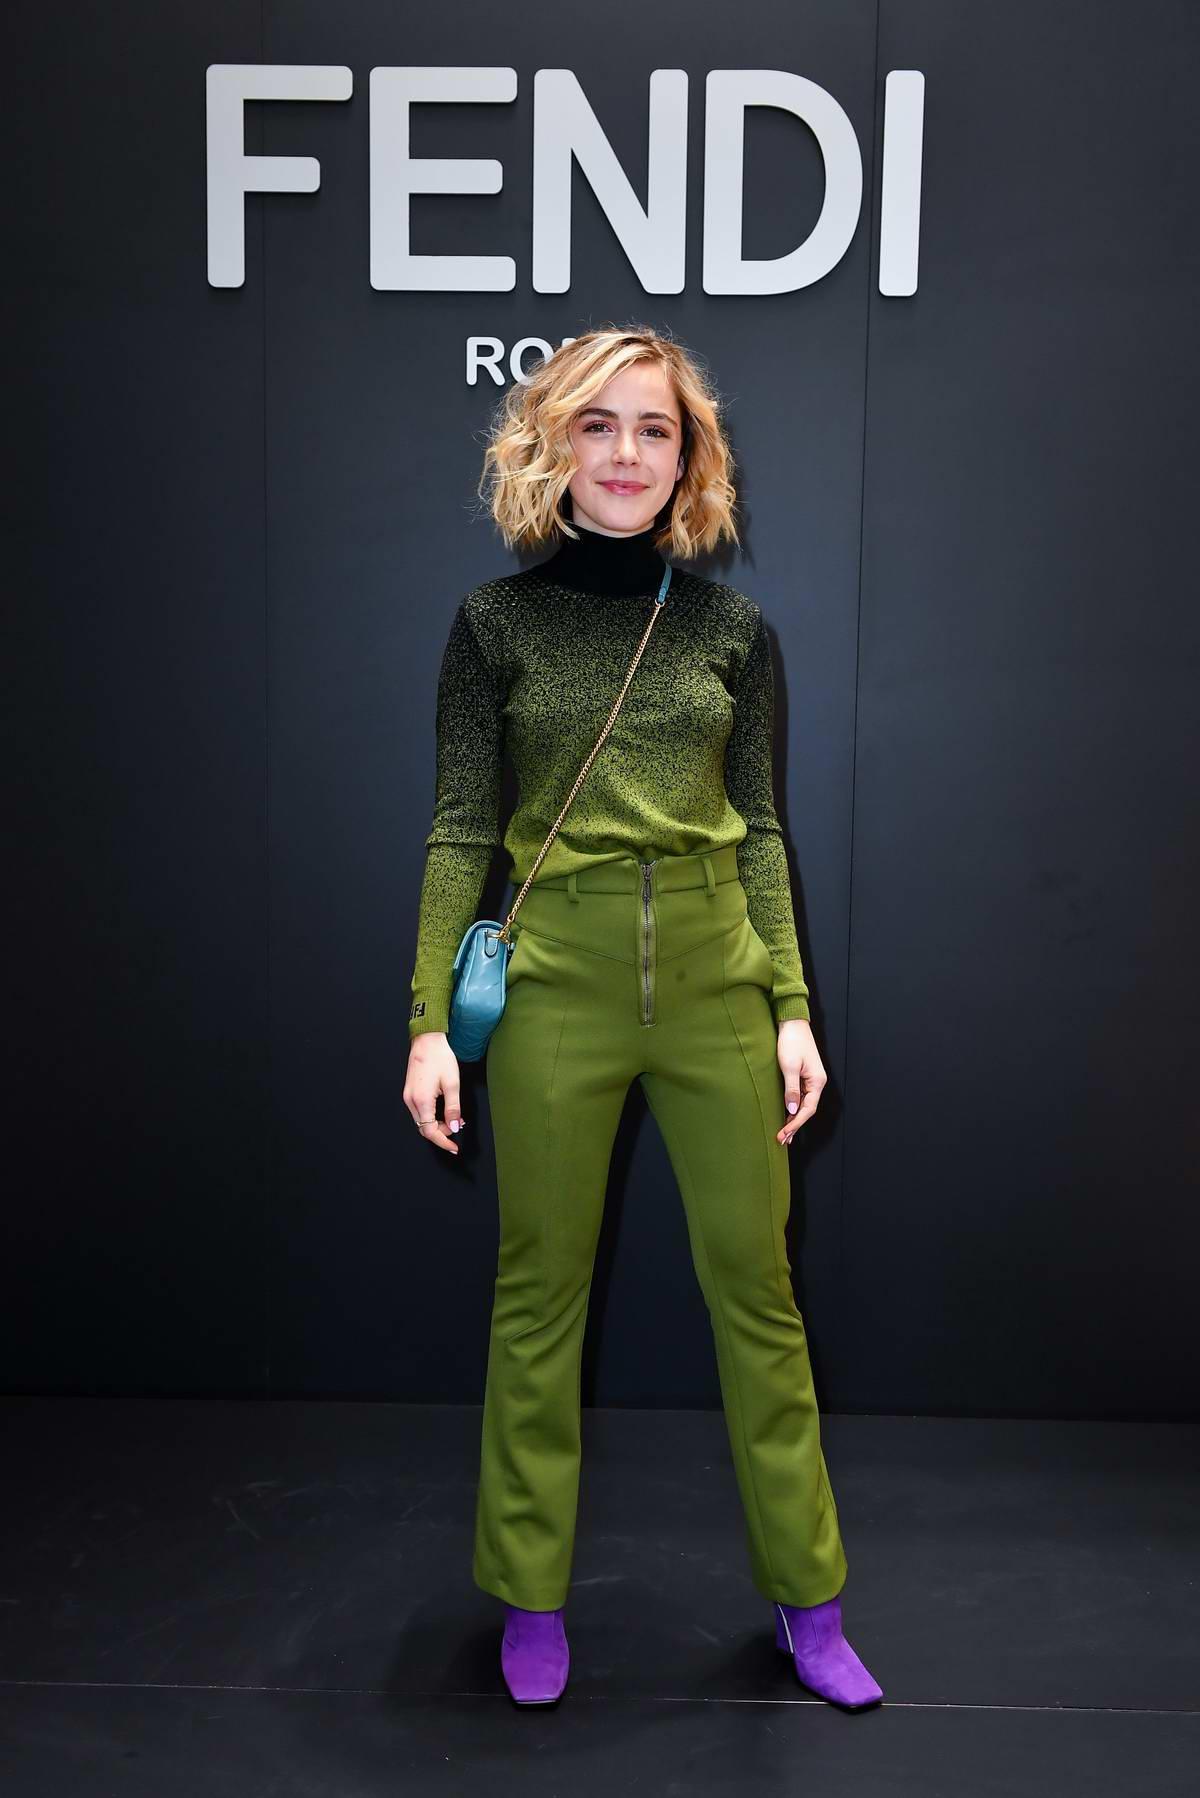 Kiernan Shipka attends Fendi Fashion Show in Milan, Italy